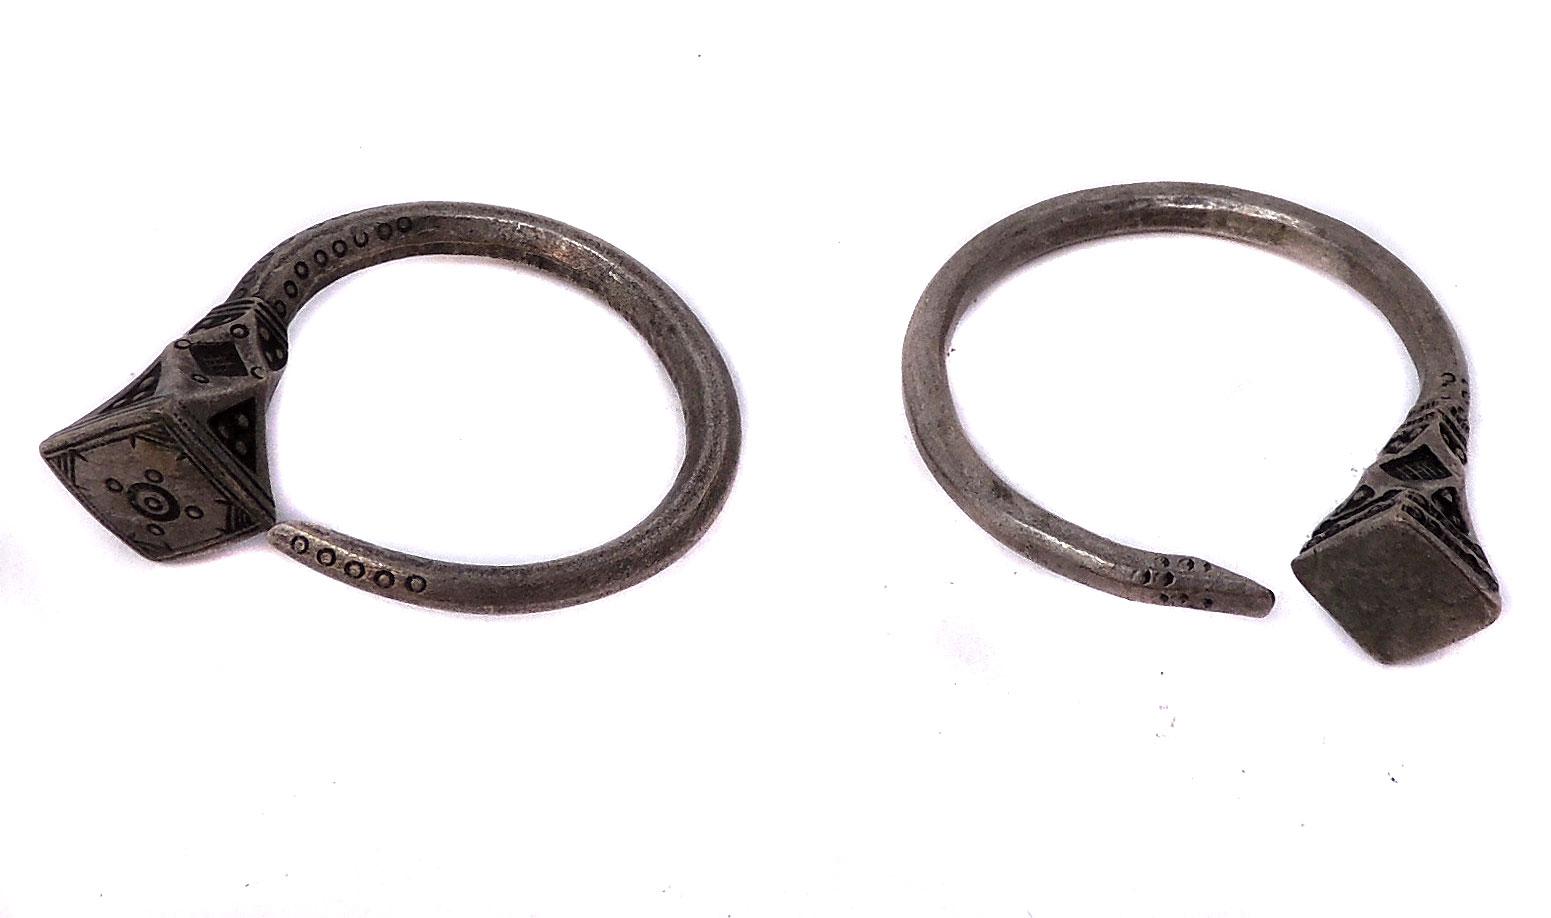 8863dc744 Tuareg Silver Hoop Earrings Mali African - Tuareg - Ethnic Jewelry